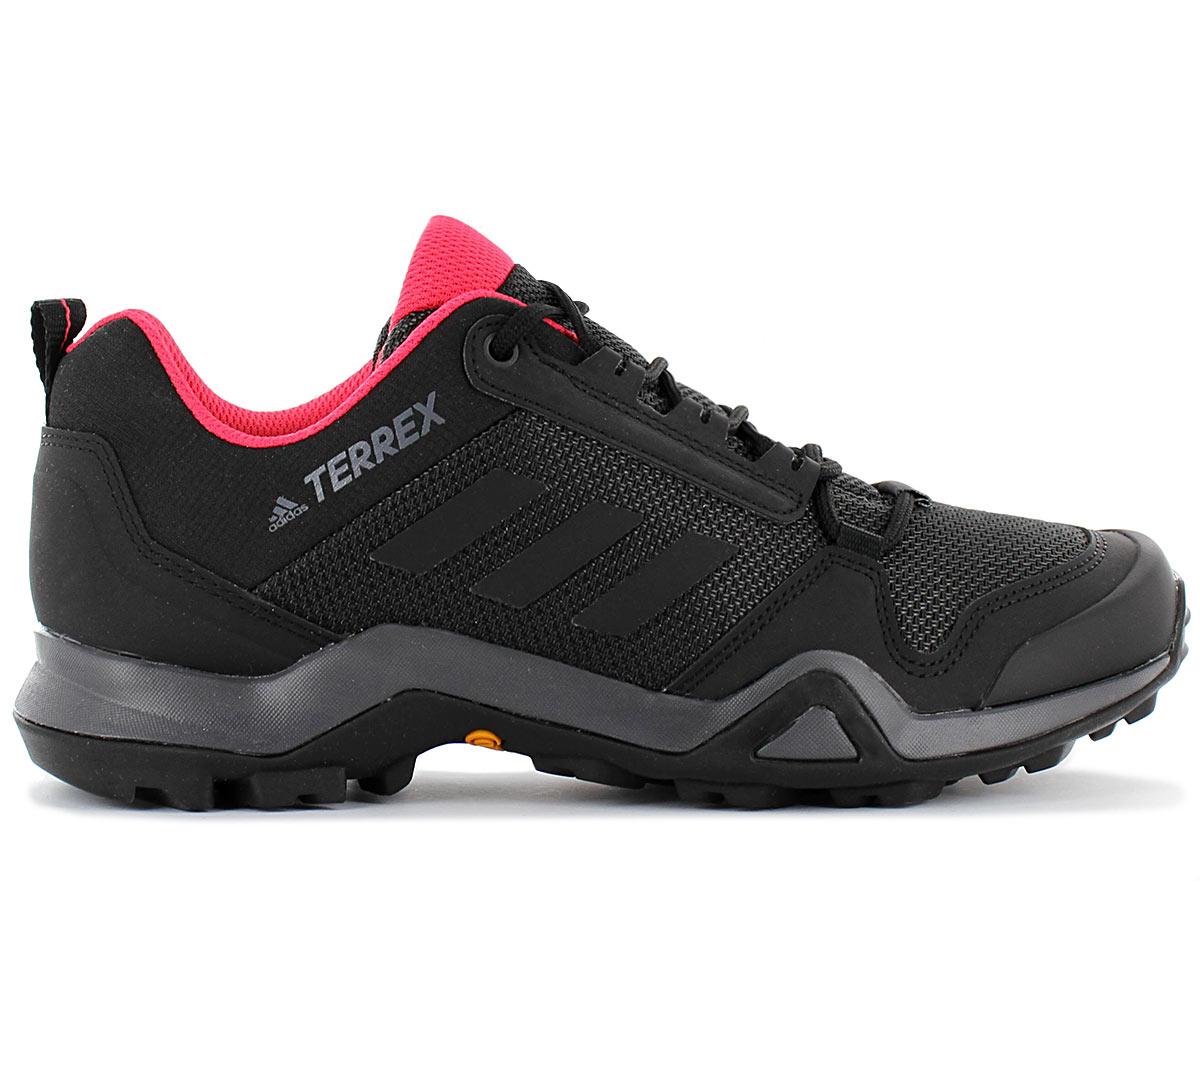 Adidas terrex AX3 W Women's Hiking